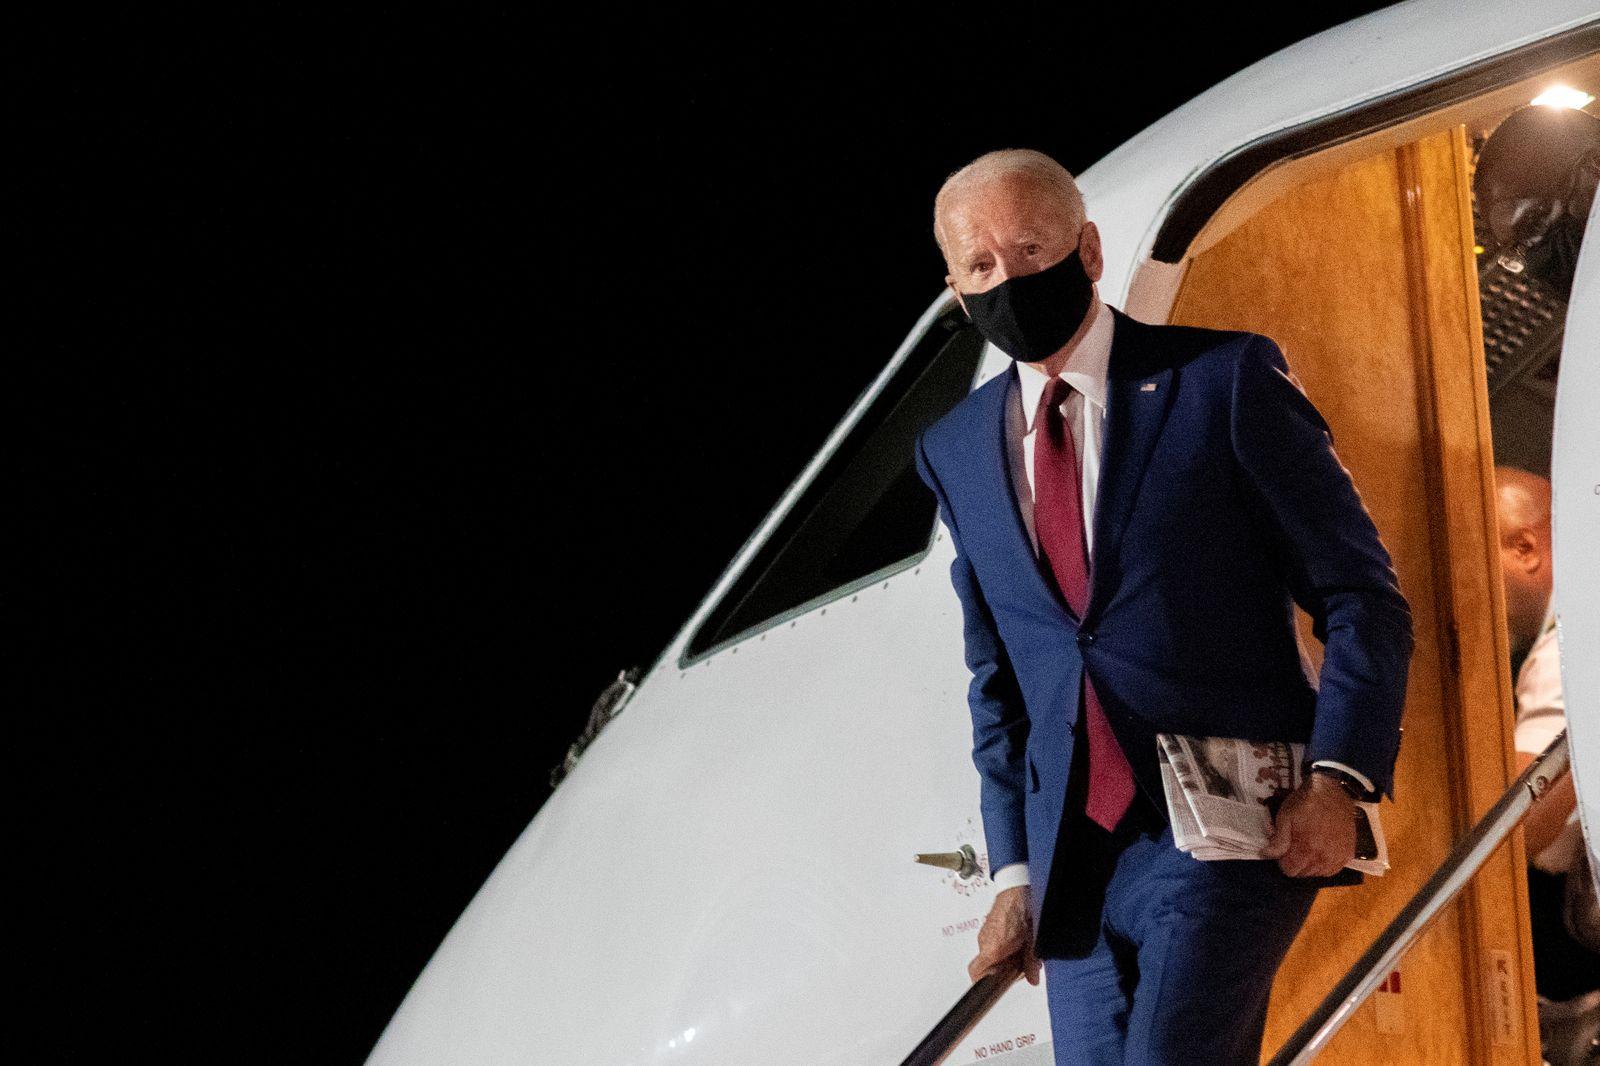 Democratic U.S. presidential nominee Joe Biden disembarks plane in New Castle, Delaware